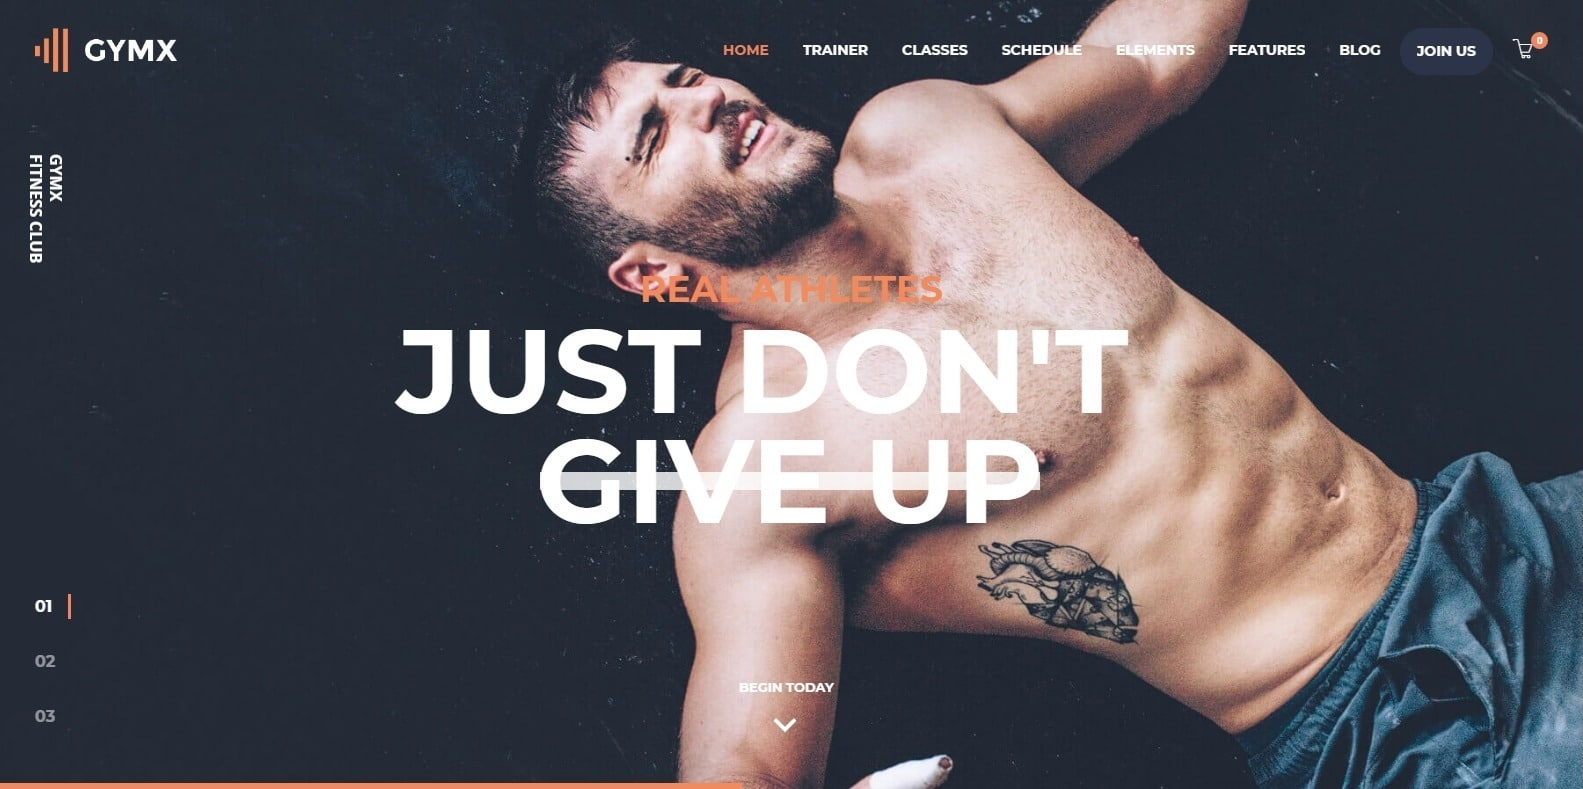 gymx-sports-website-template